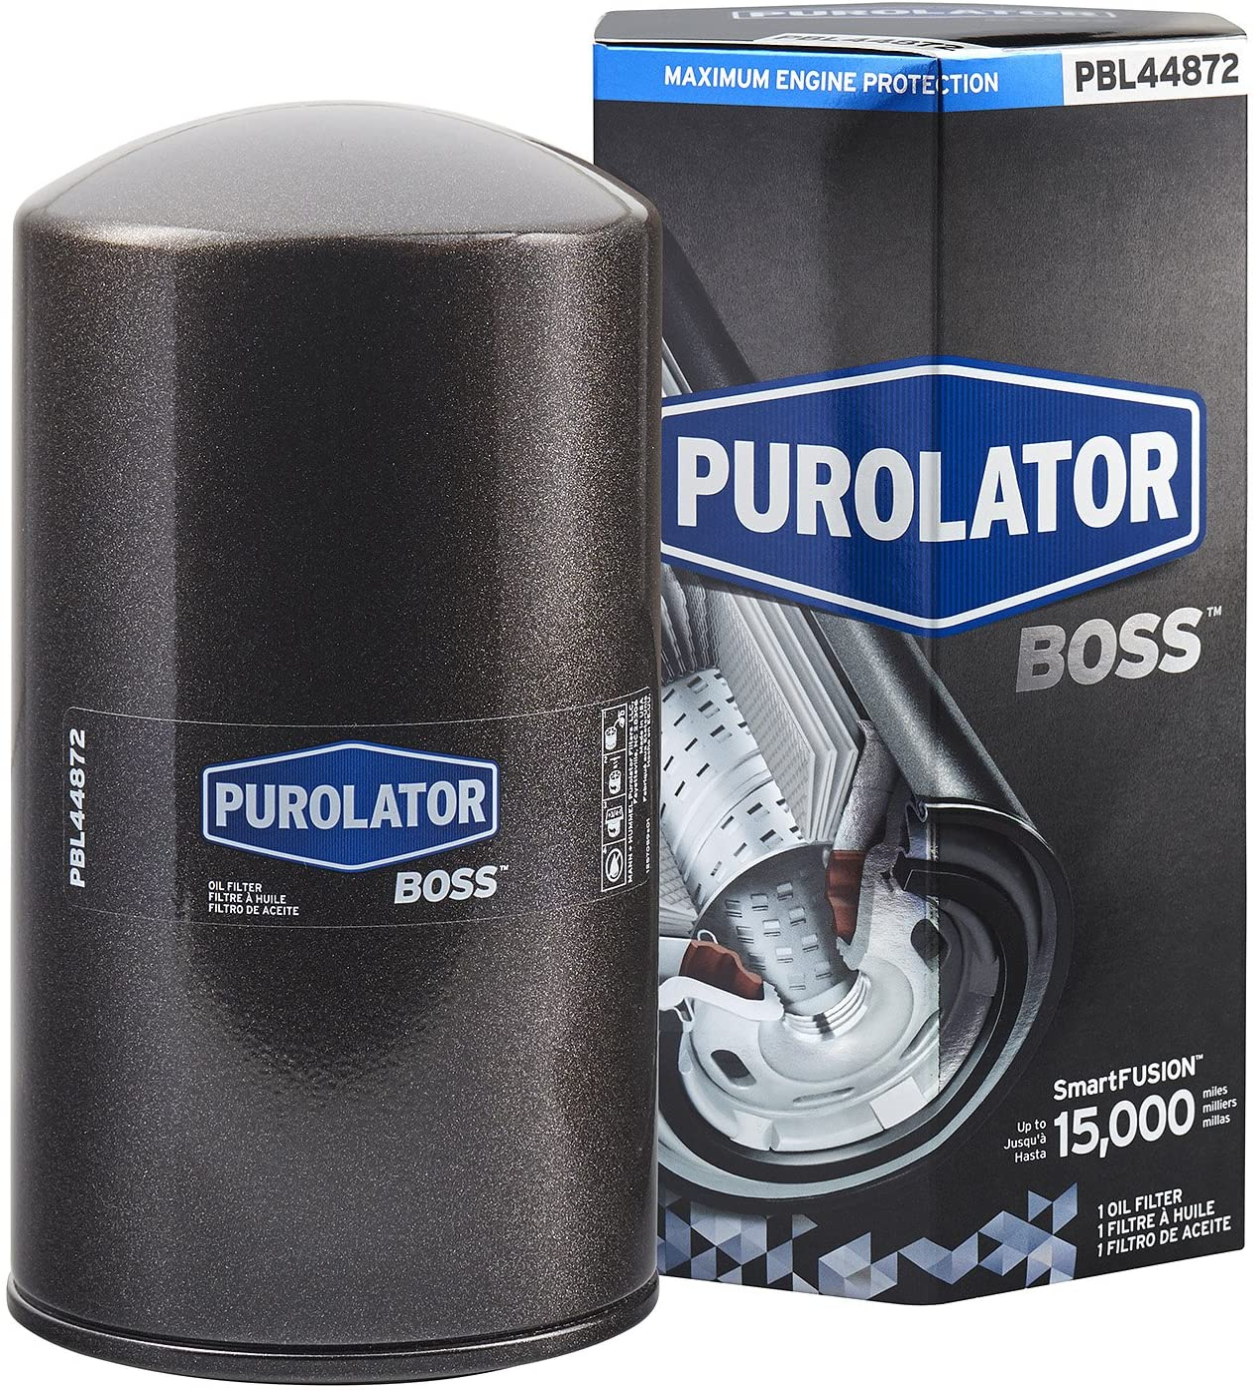 Purolator PBL44872 Black Single PurolatorBOSS Maximum Engine Protection Spin On Oil Filter